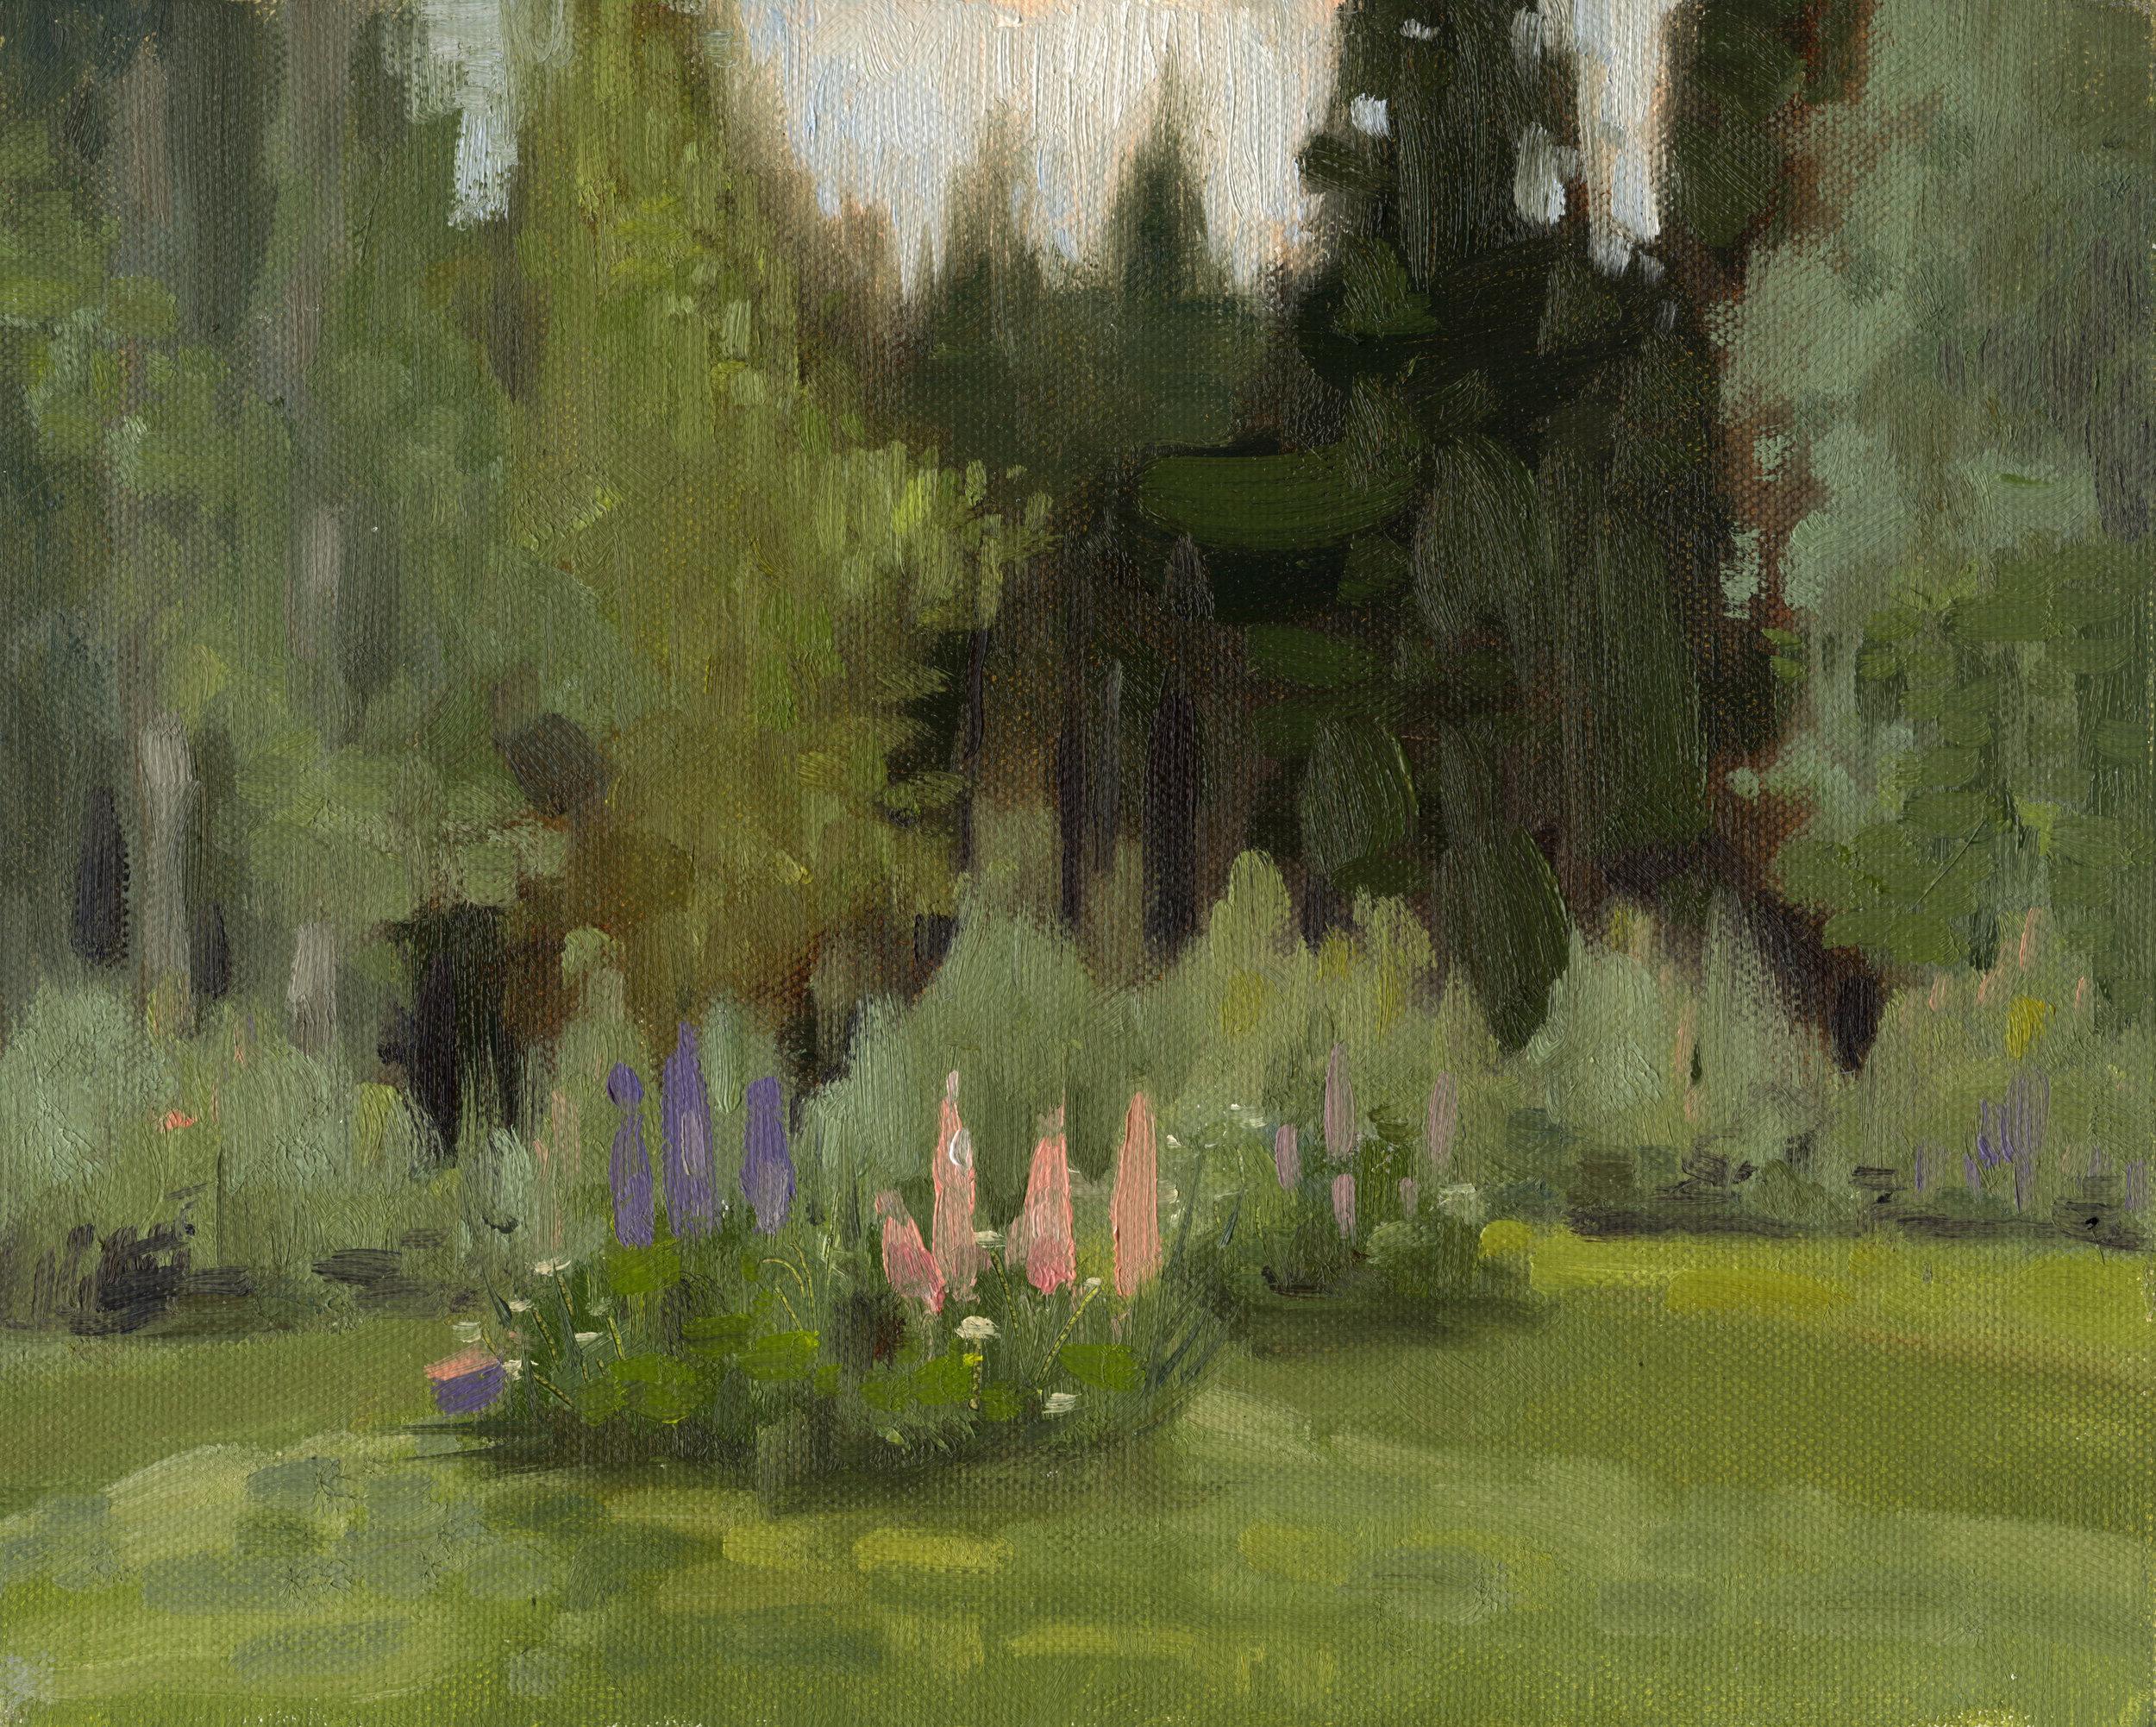 Garden in Sweden